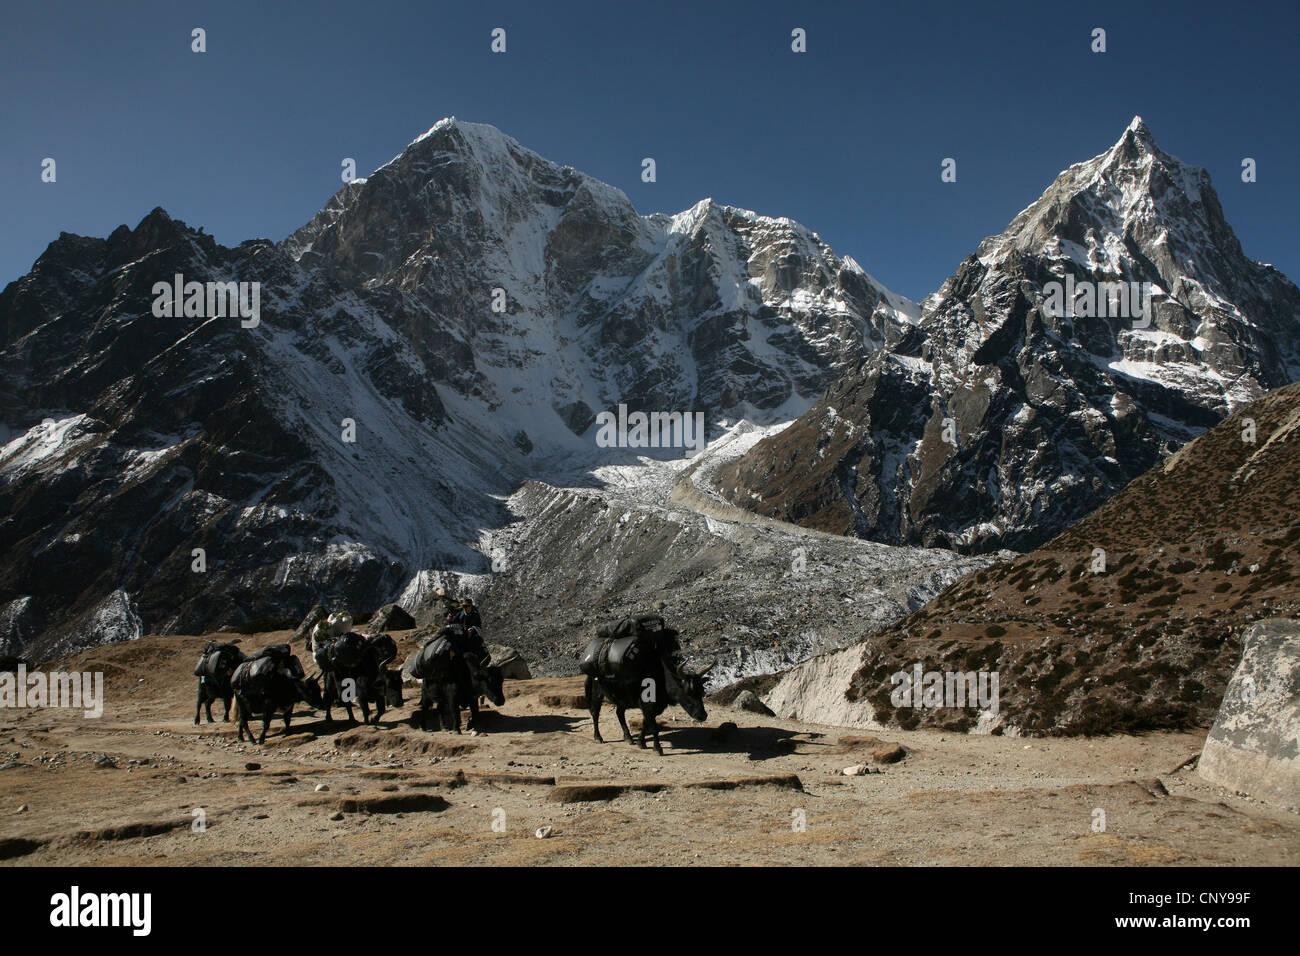 Zopkio caravan in front of Mount Taboche (6,542 m) in Khumbu region in the Himalayas, Nepal. Stock Photo